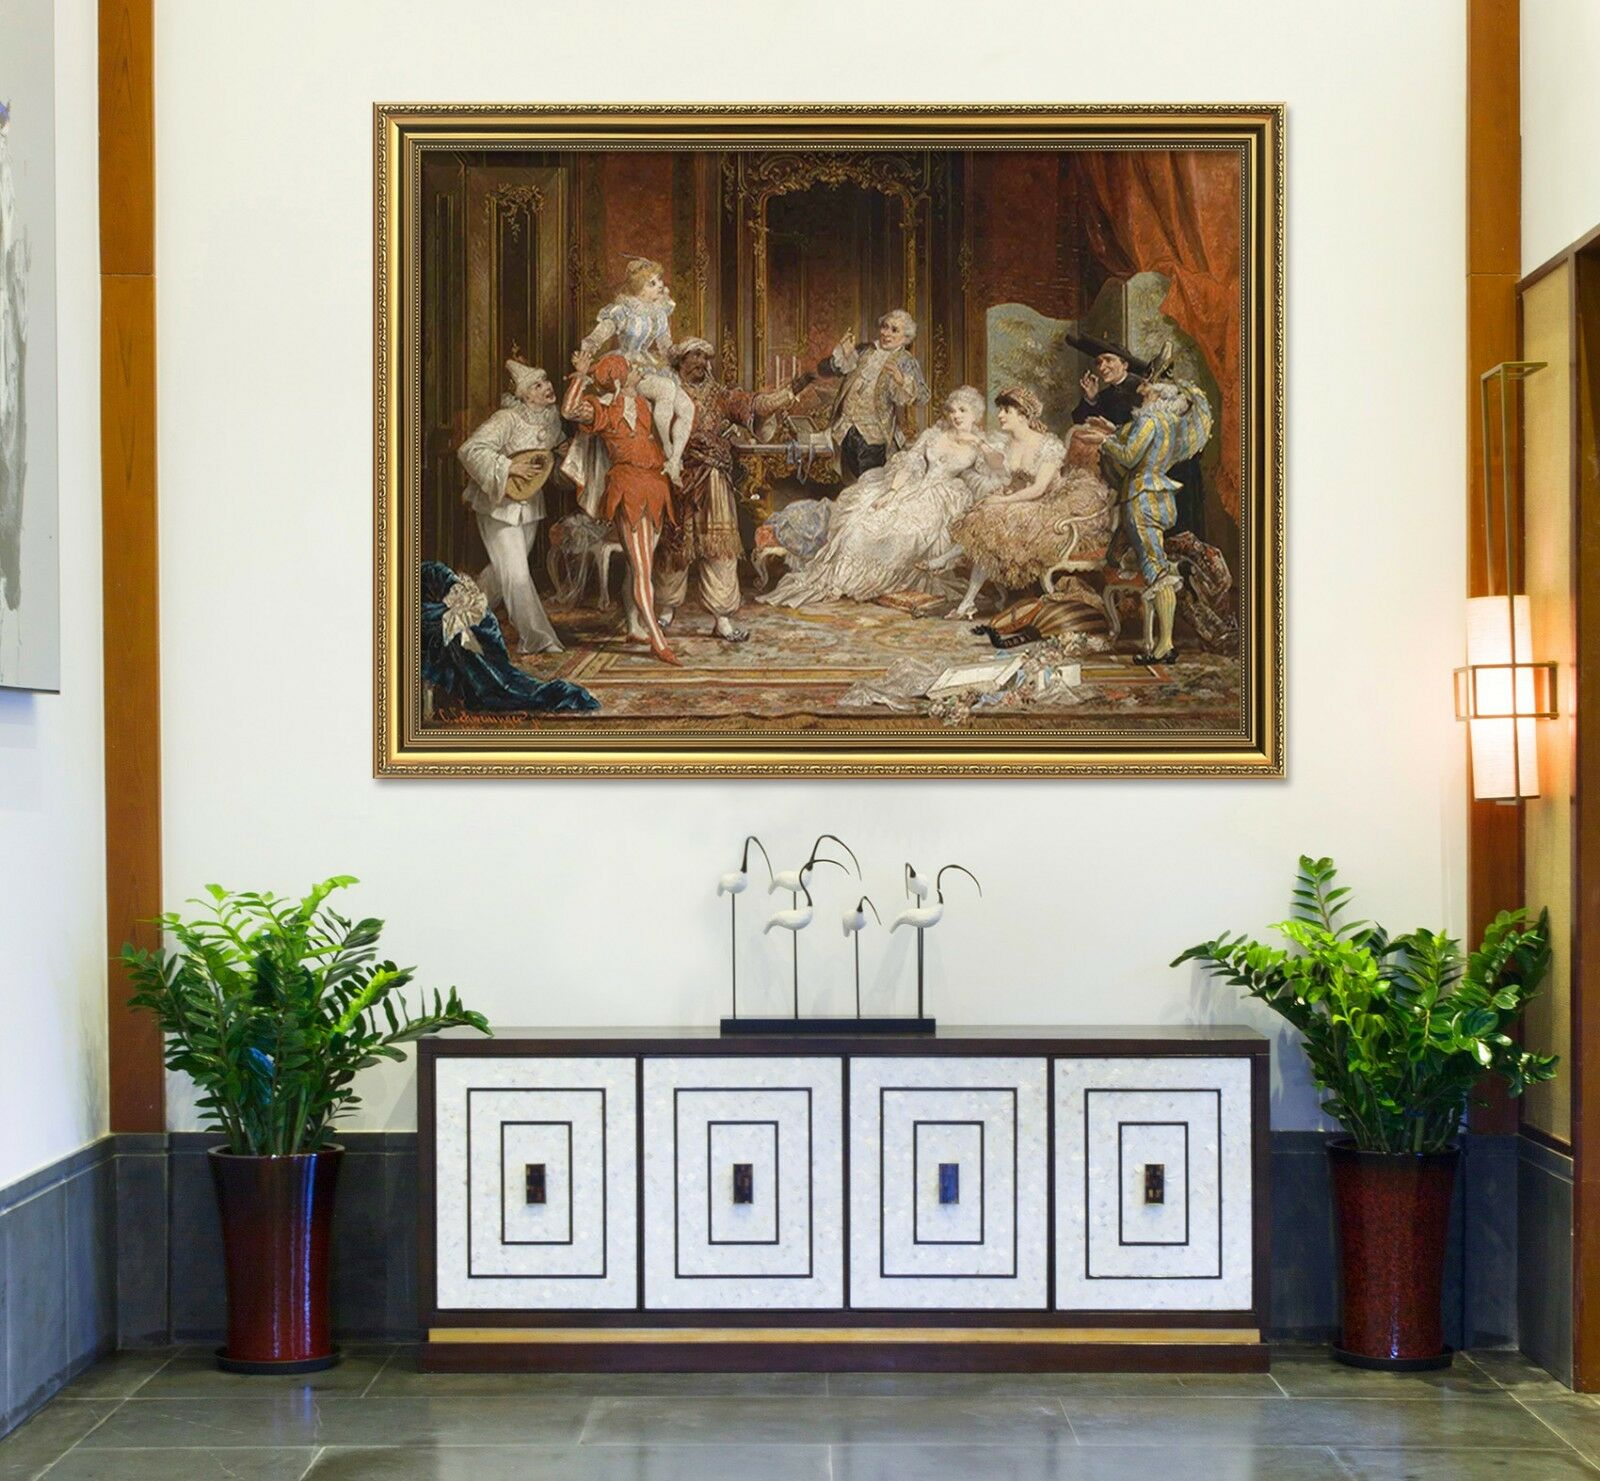 3D Man Lifts High 42 Framed Poster Home Decor Drucken Painting Kunst AJ WandPapier